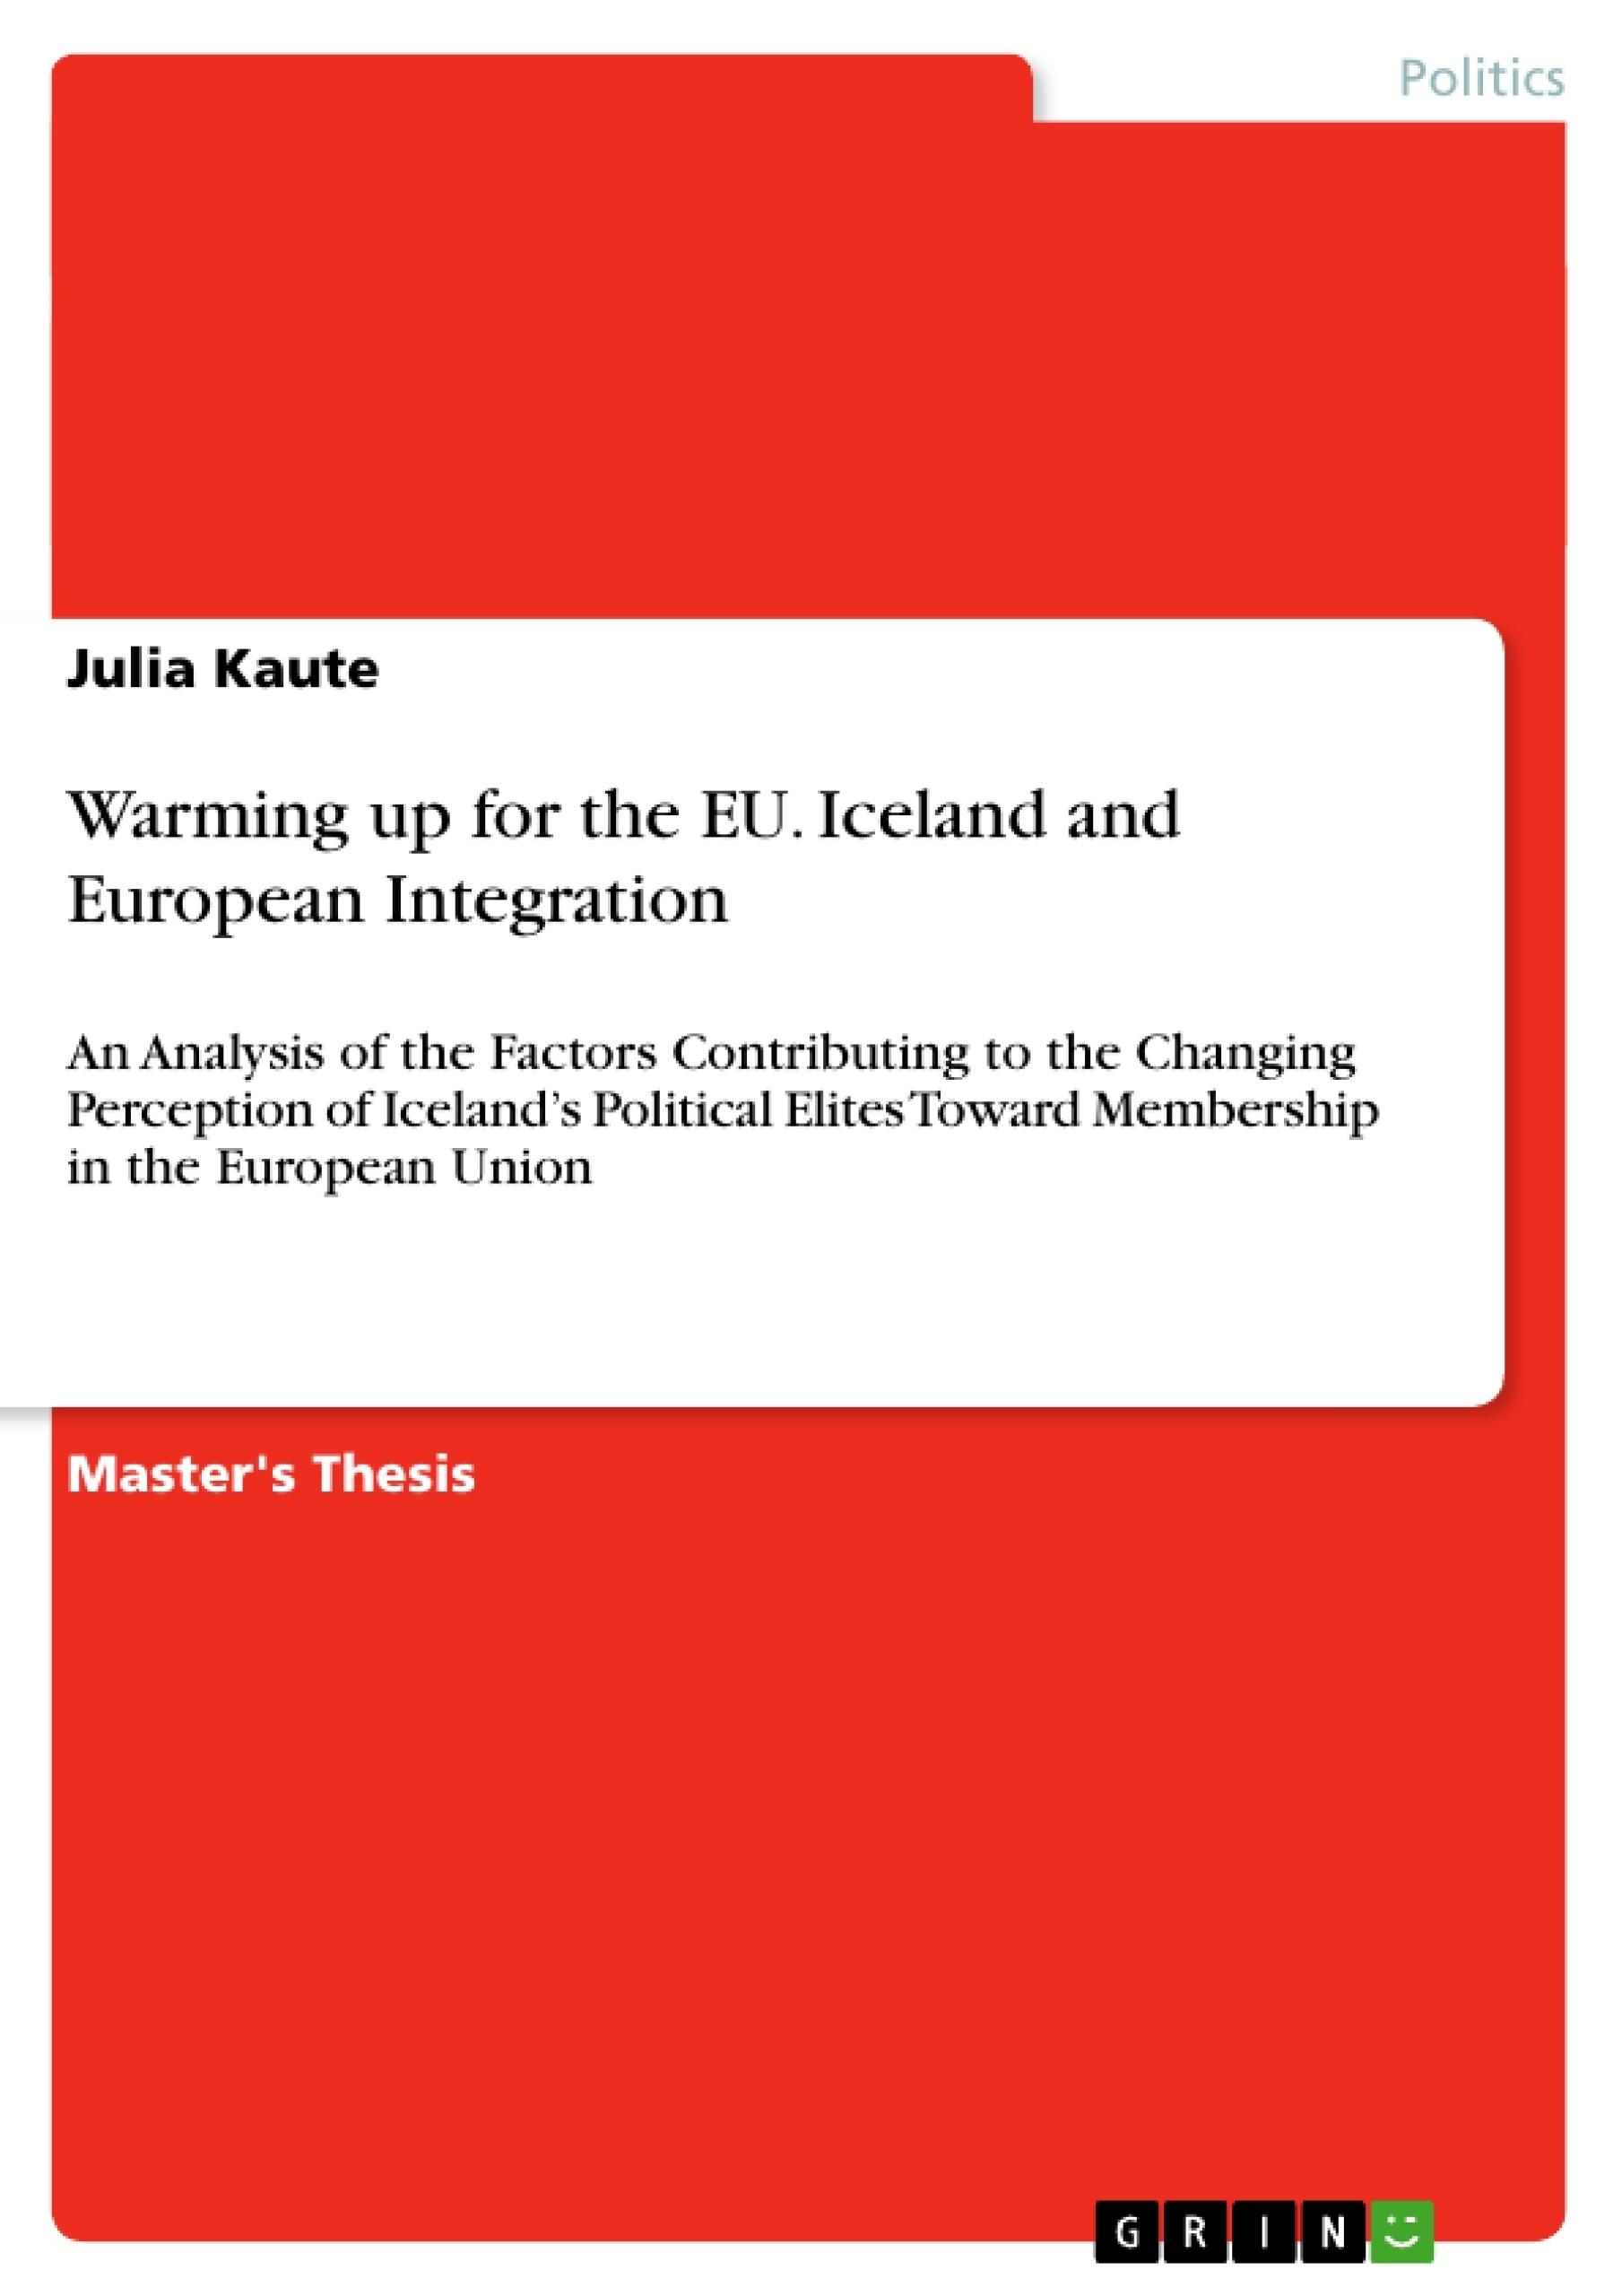 Master thesis european integration cartoons